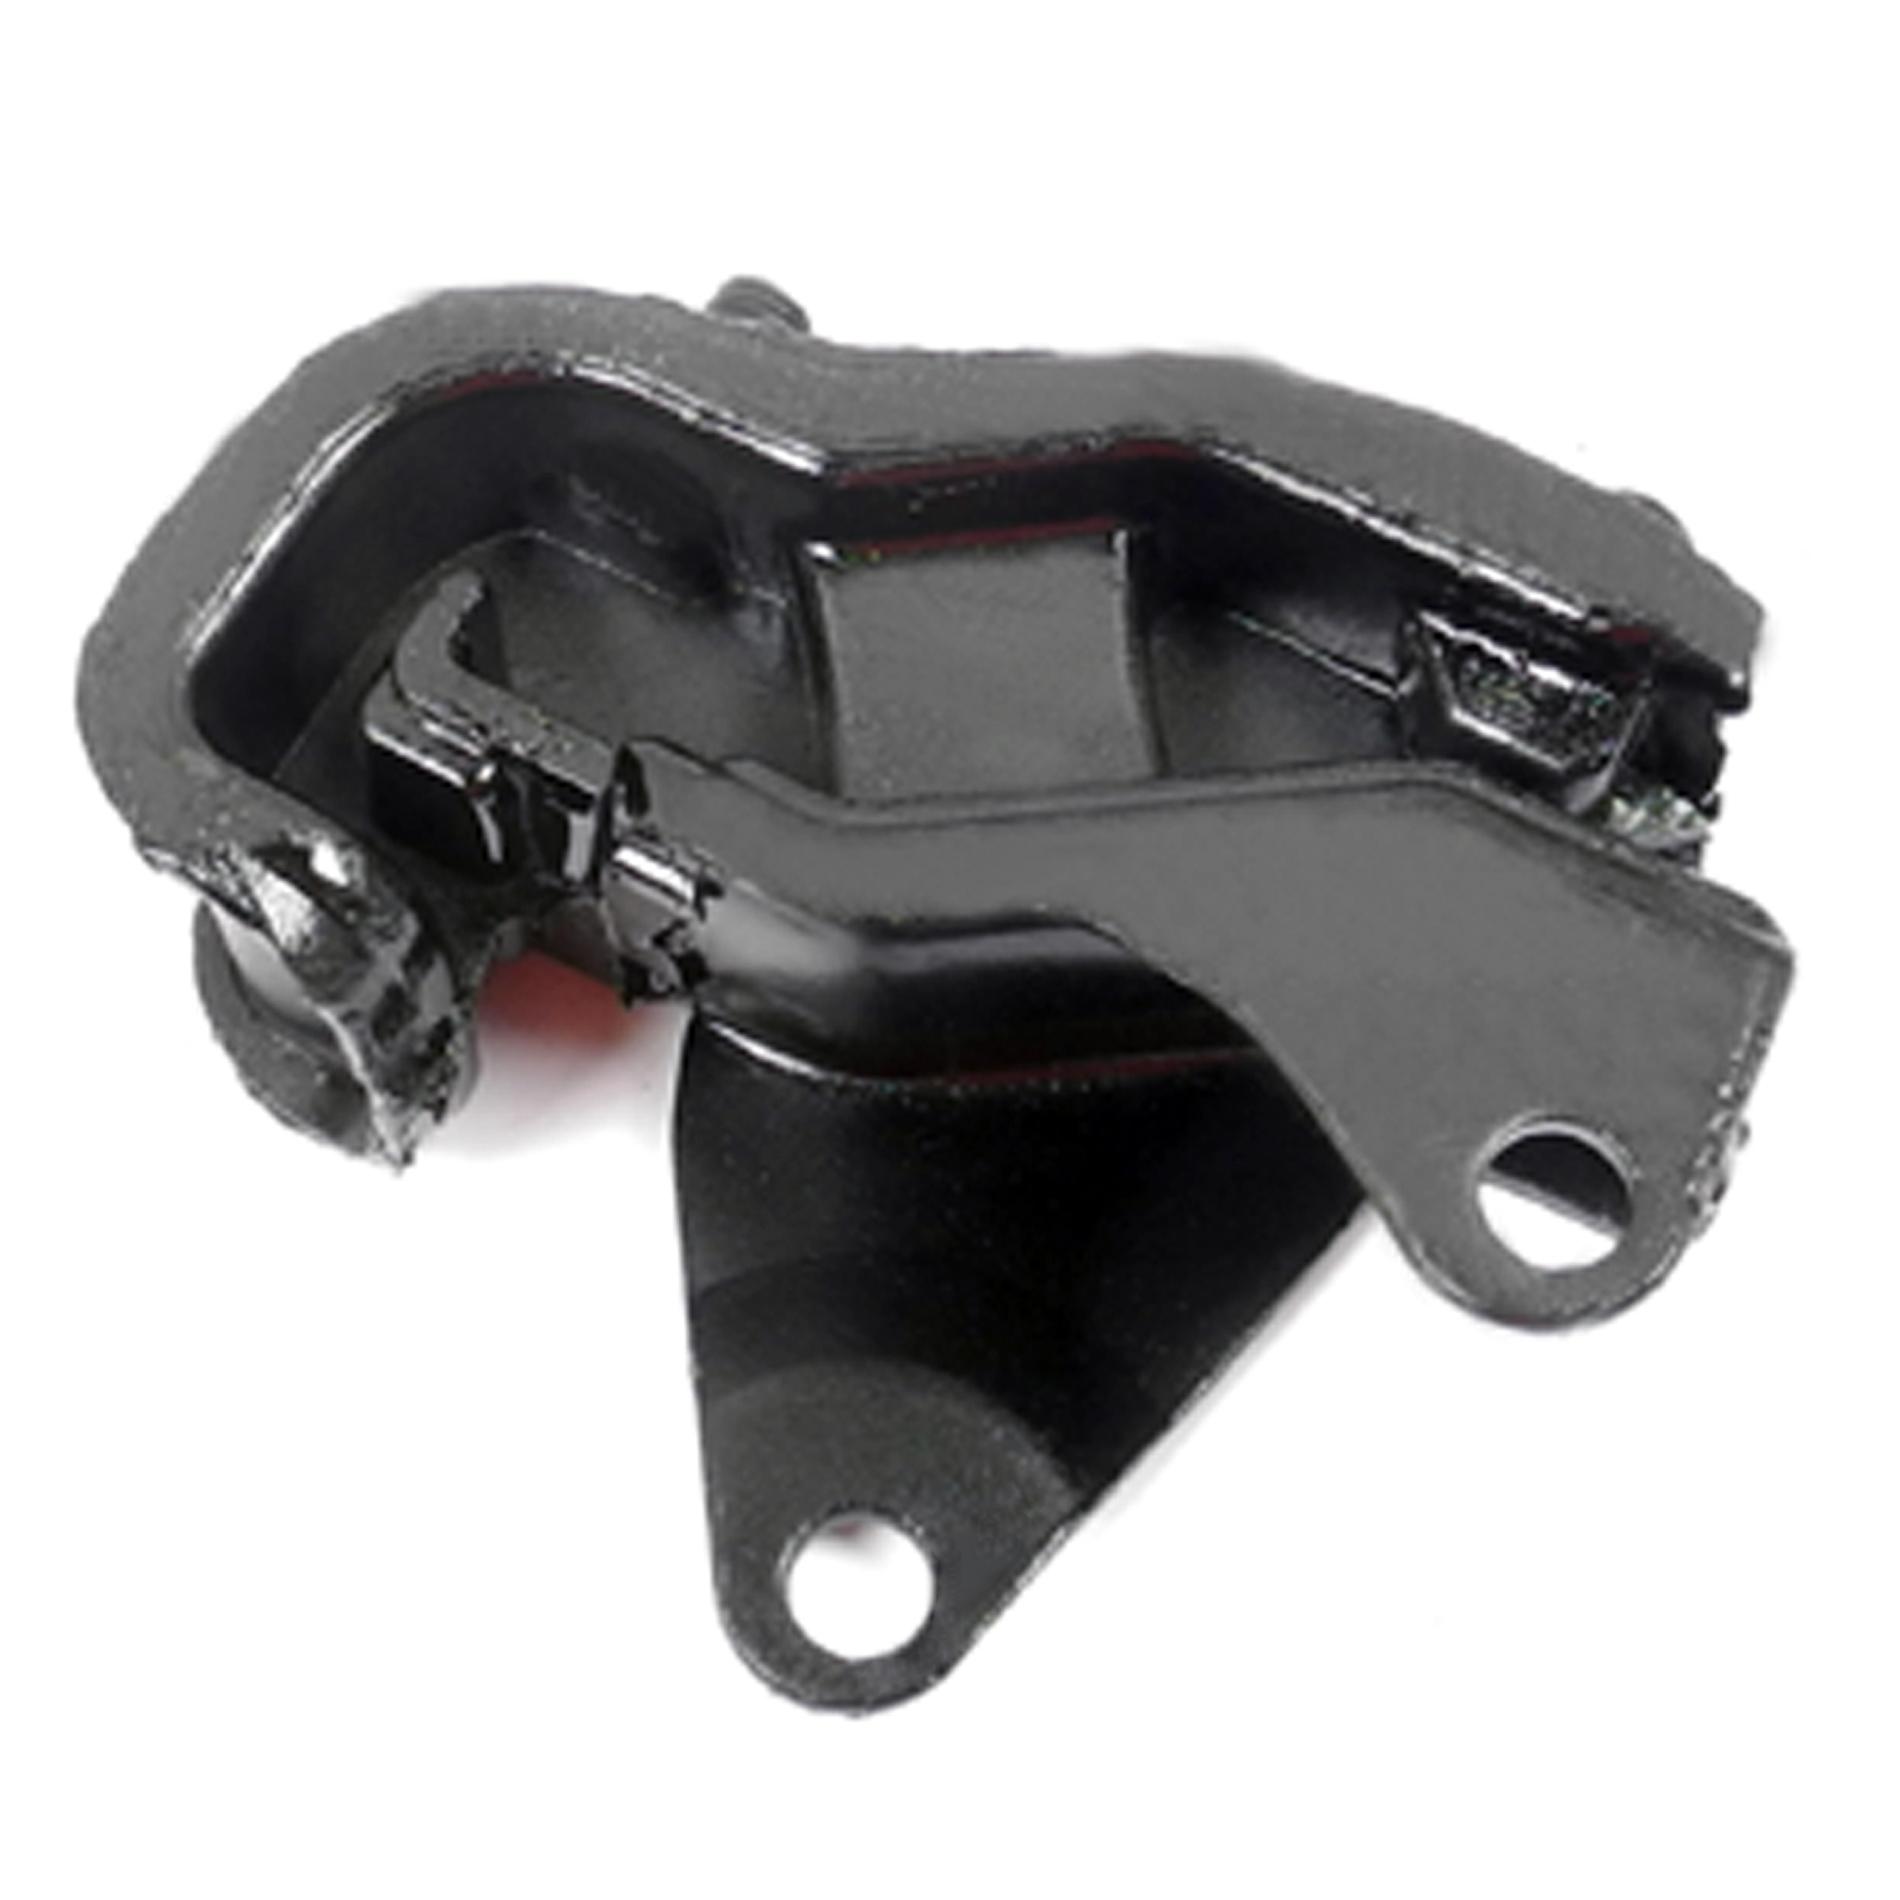 MotorKing Rear Engine Motor Mount 65017 For 2008-2010 Honda Odyssey 3.5L i-VTEC Version